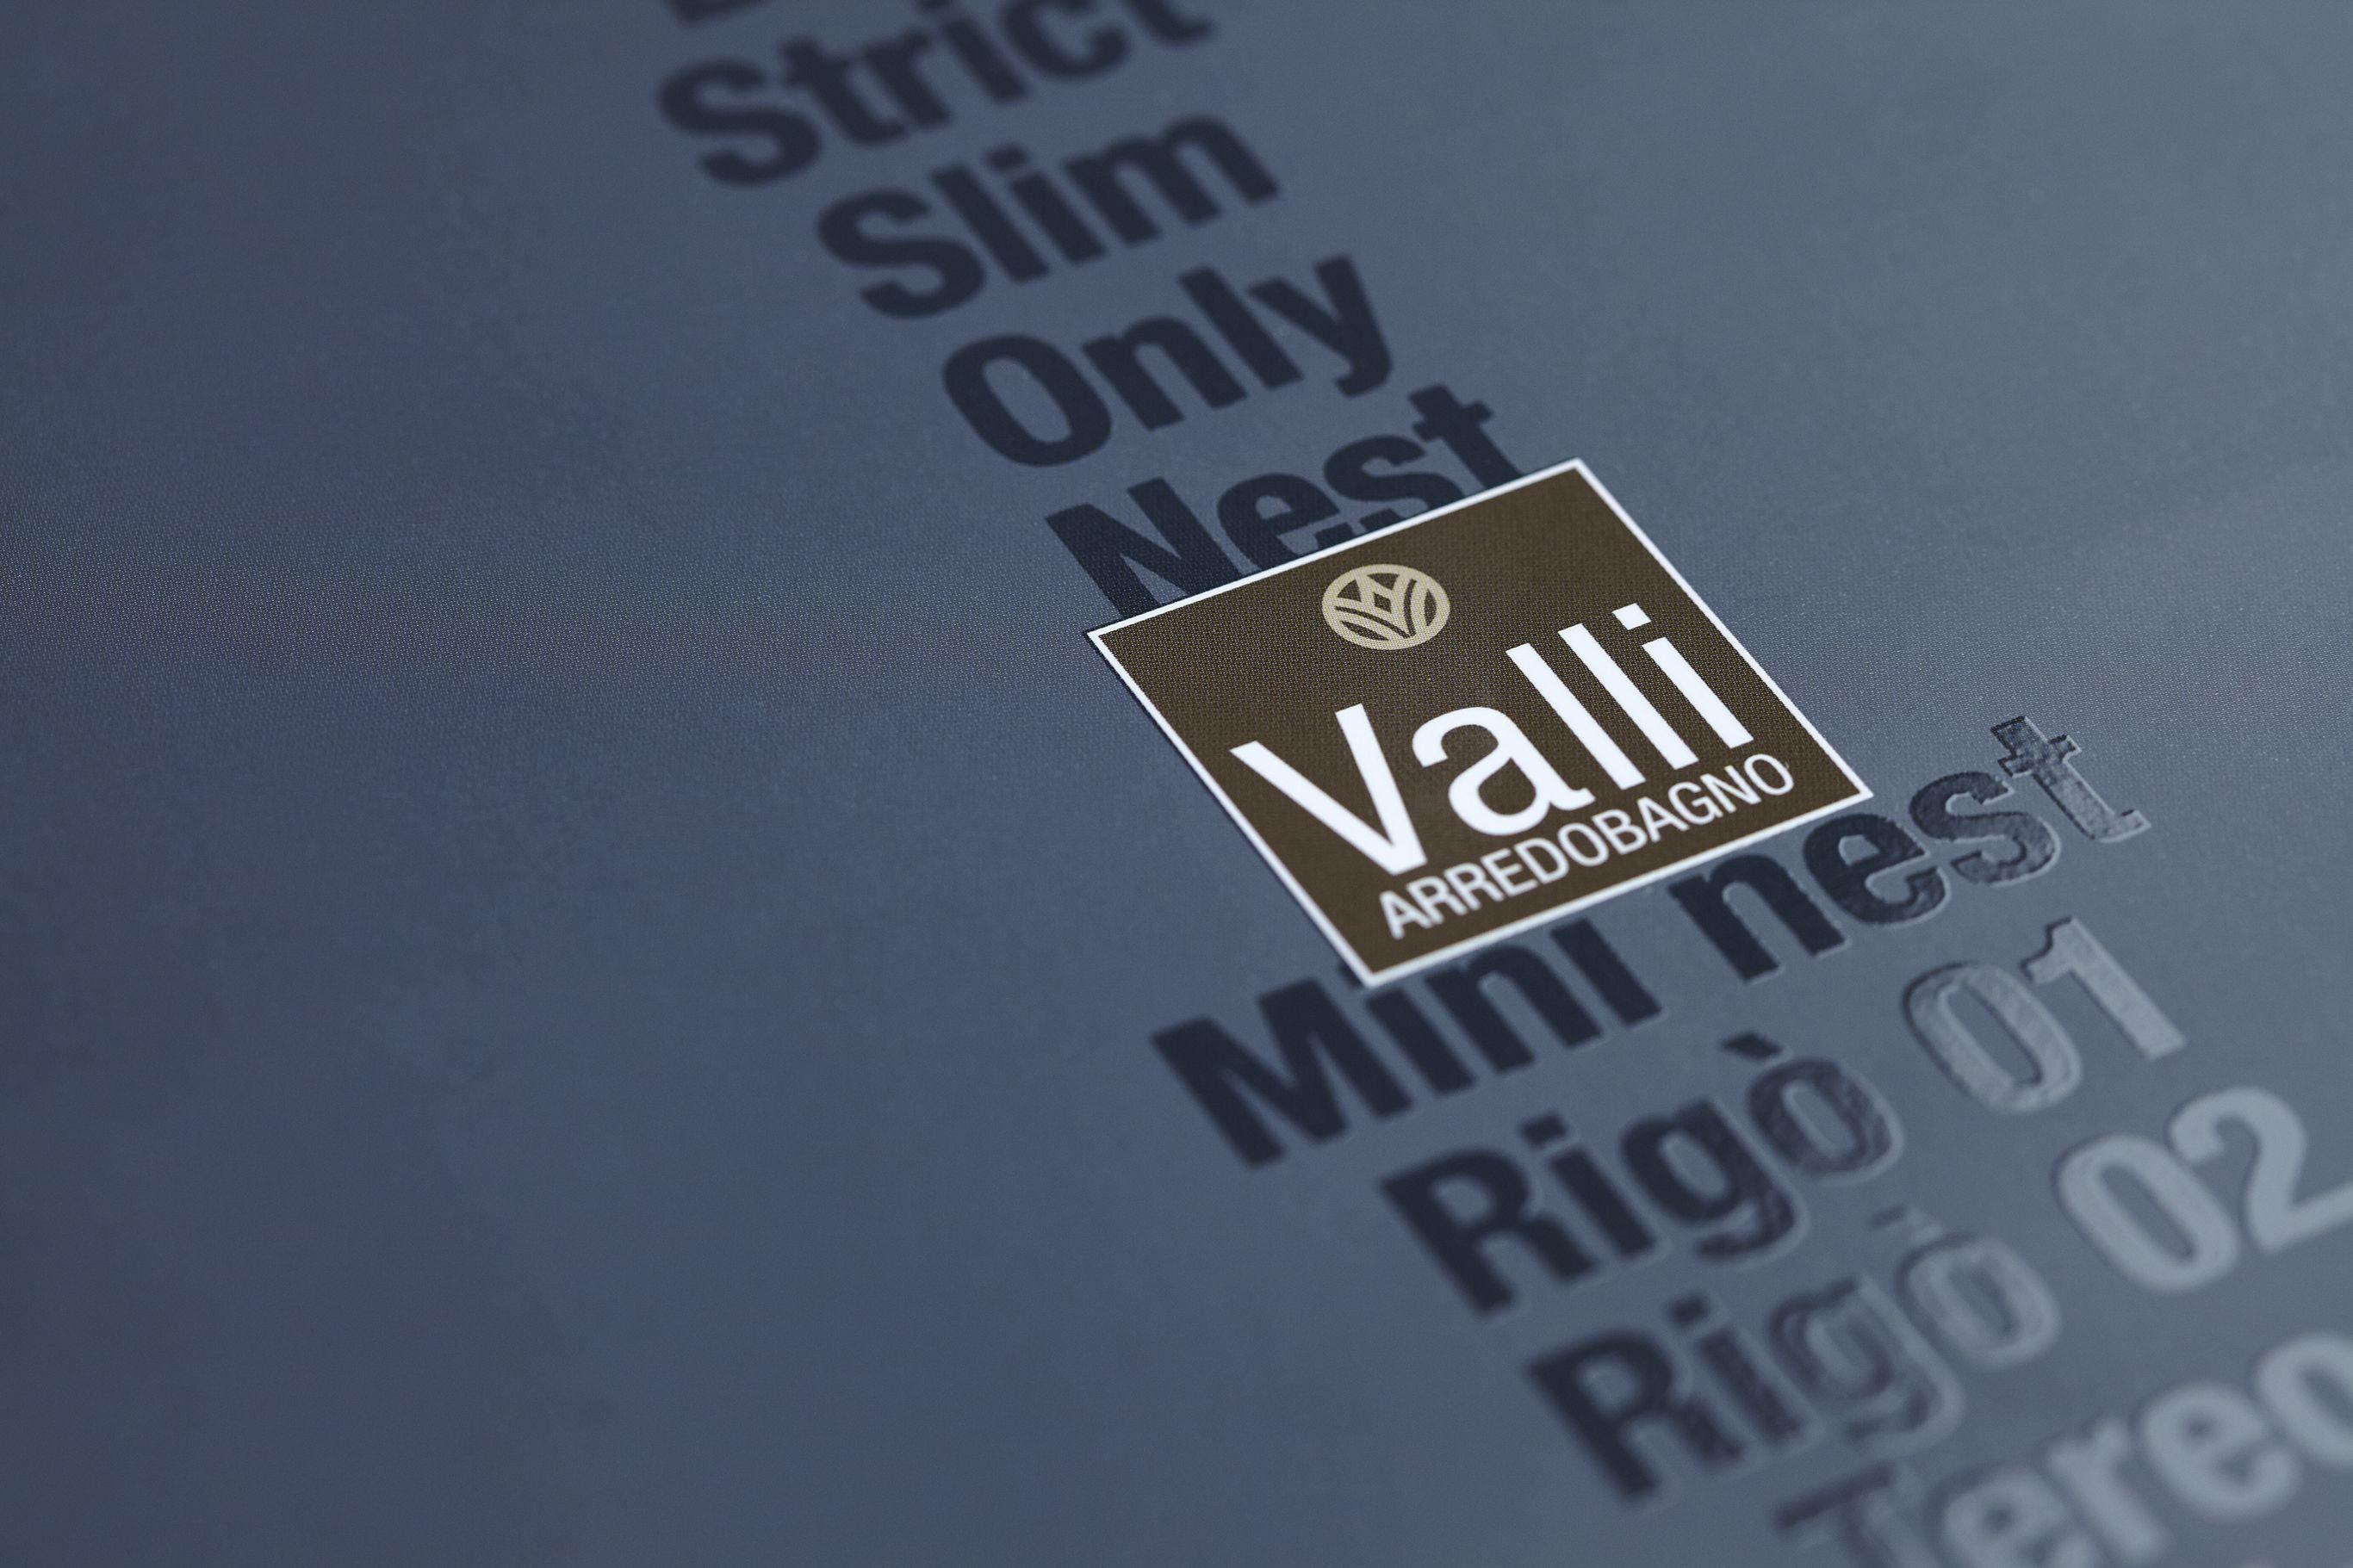 Valli Arredobagno ~ New valli arredobagno 2015 catalogue. design by hangar design